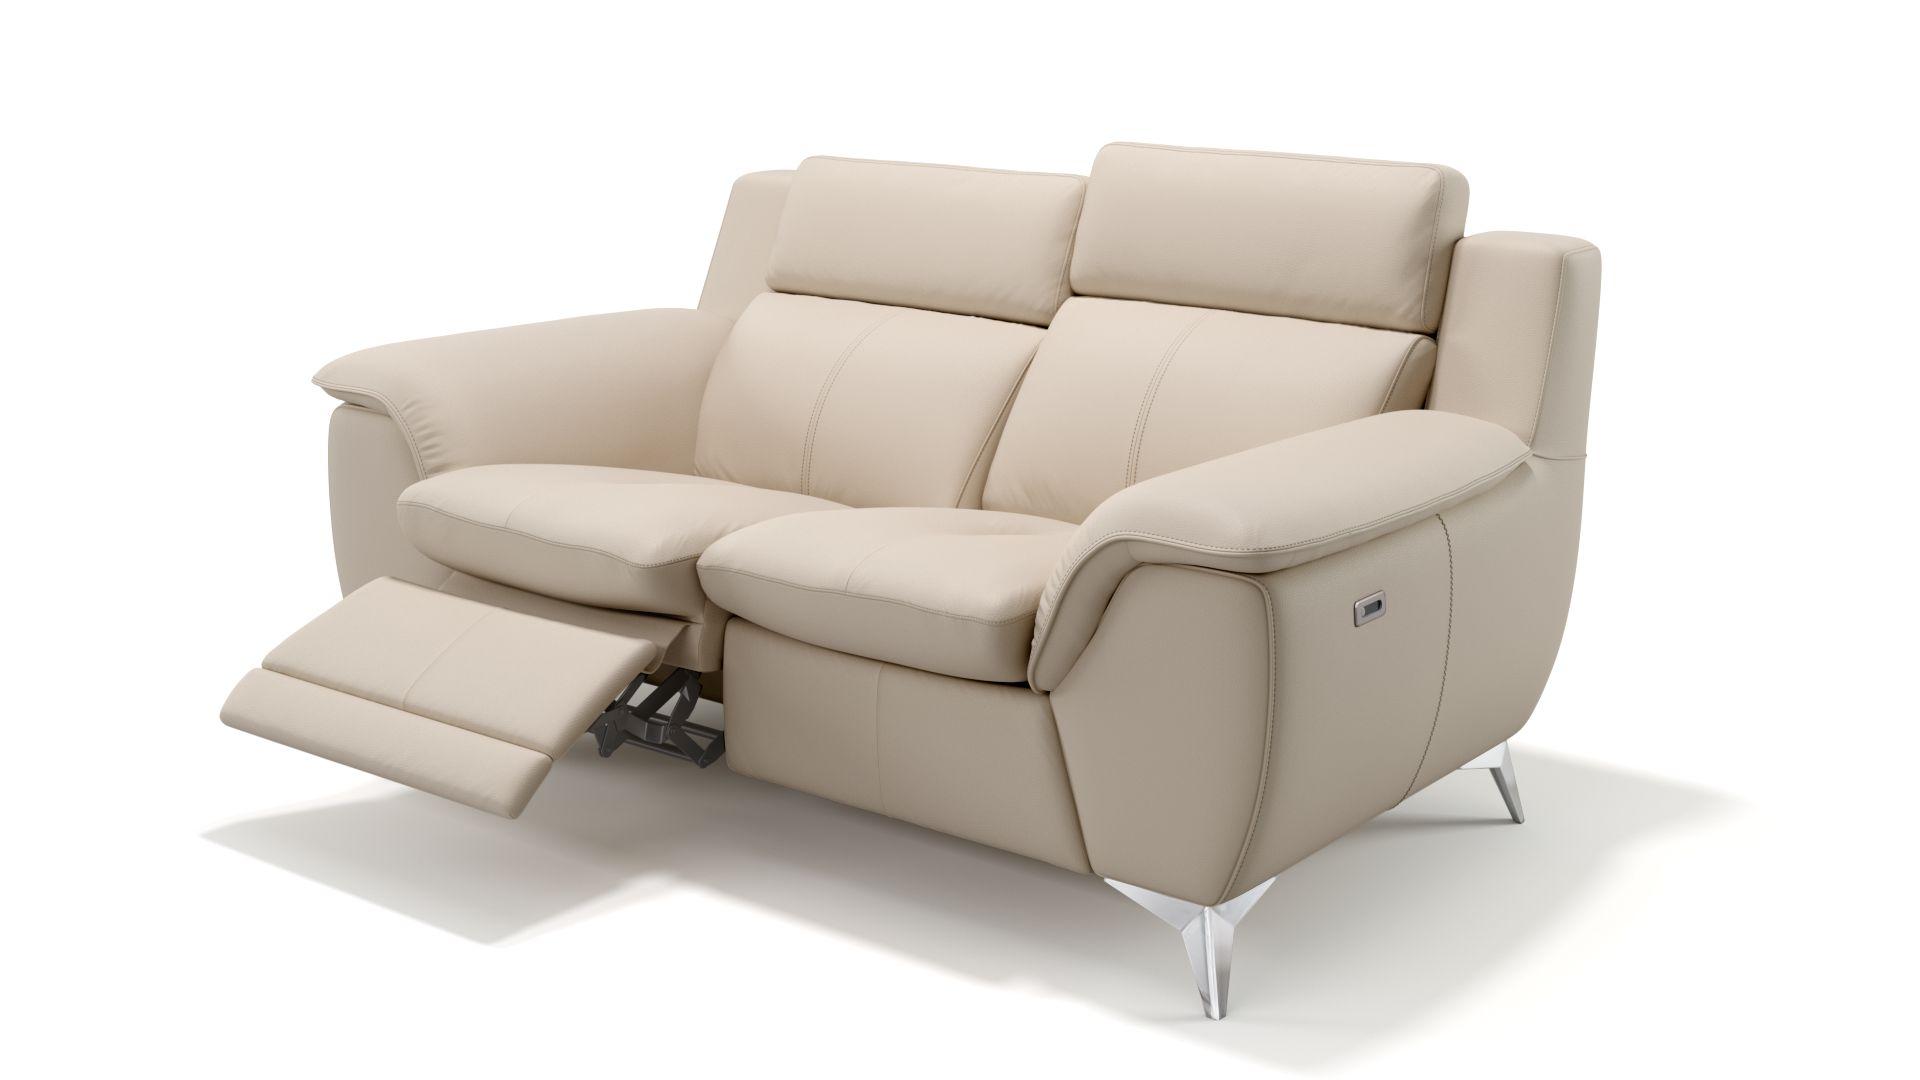 Leder 2-Sitzer Sofa AVERSA